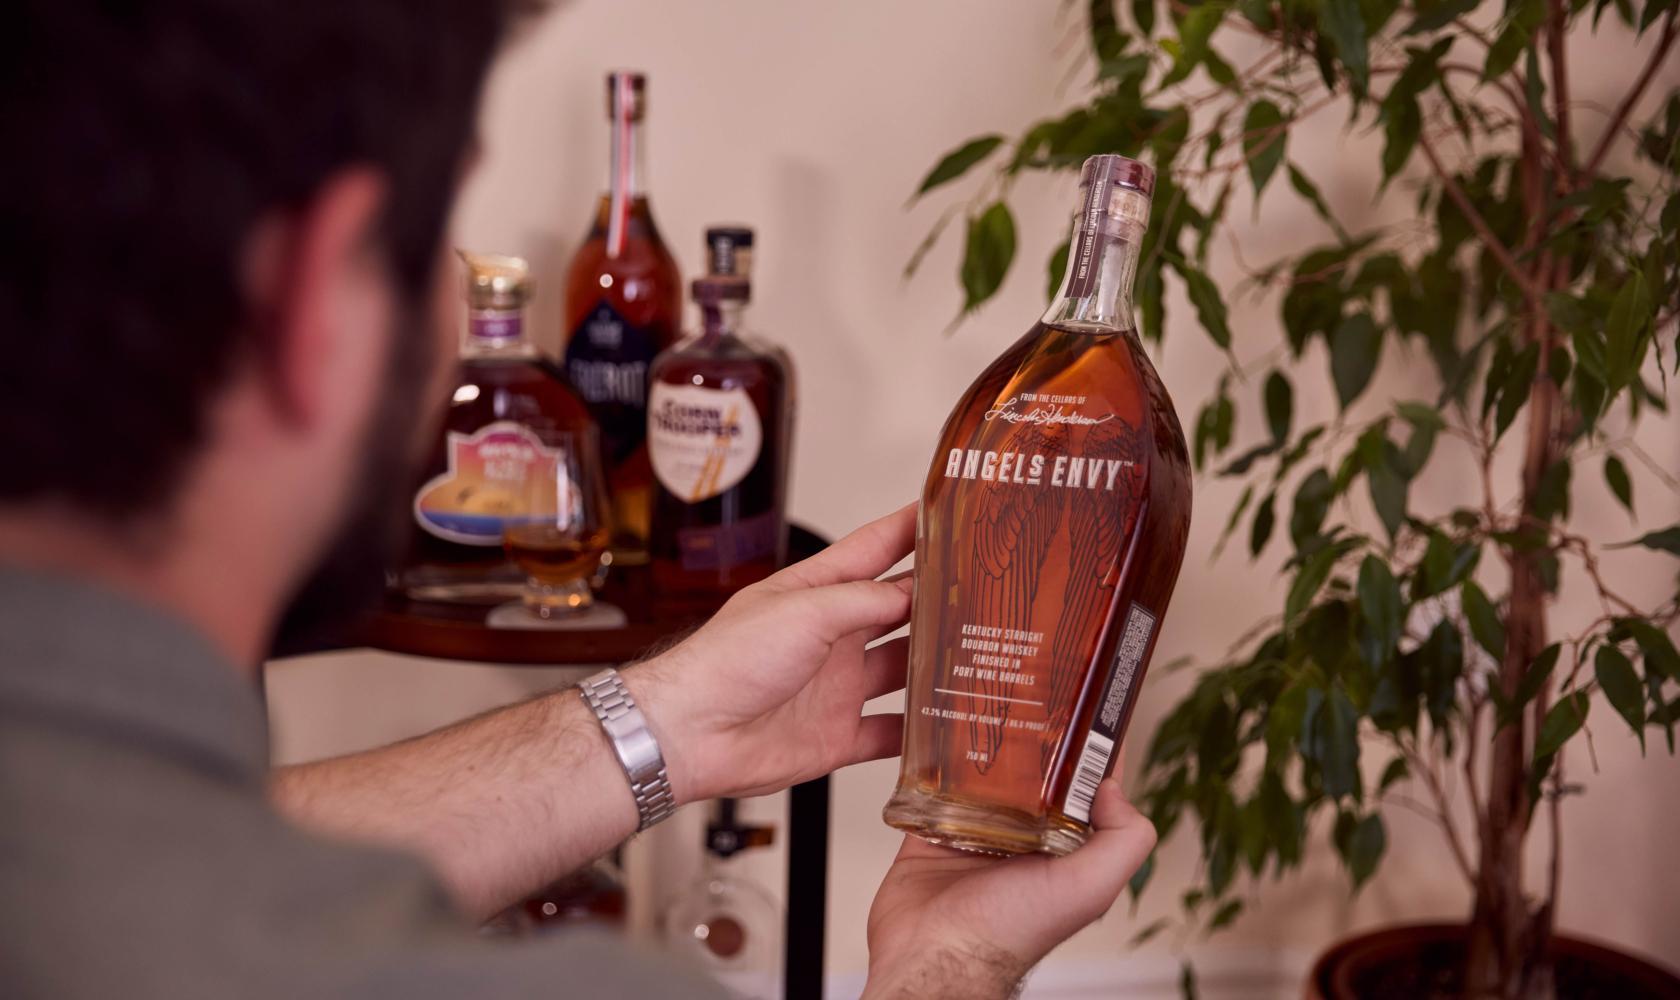 Angels Envy Kentucky Straight Bourbon